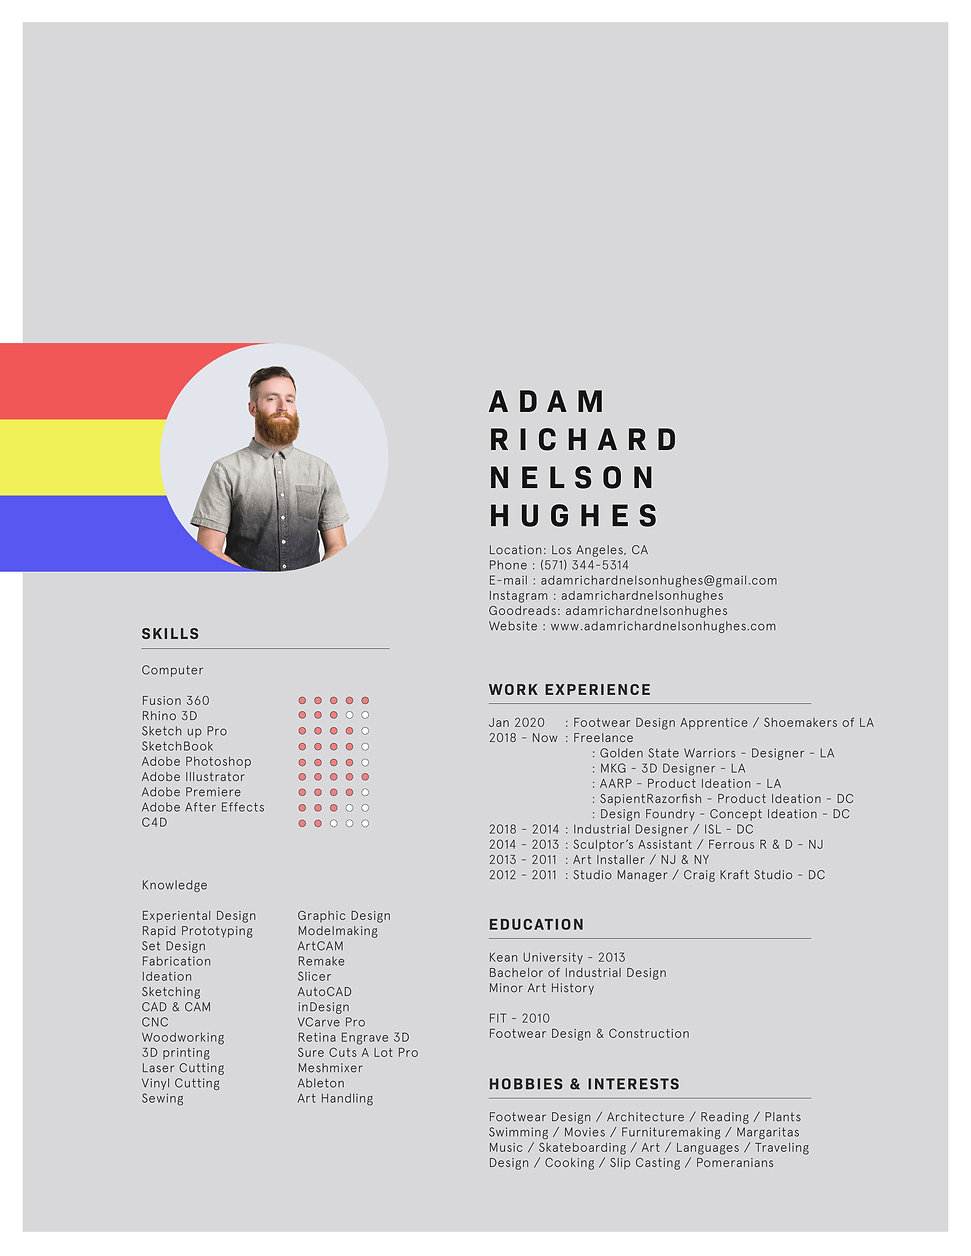 AdamHughes-Resume.jpg